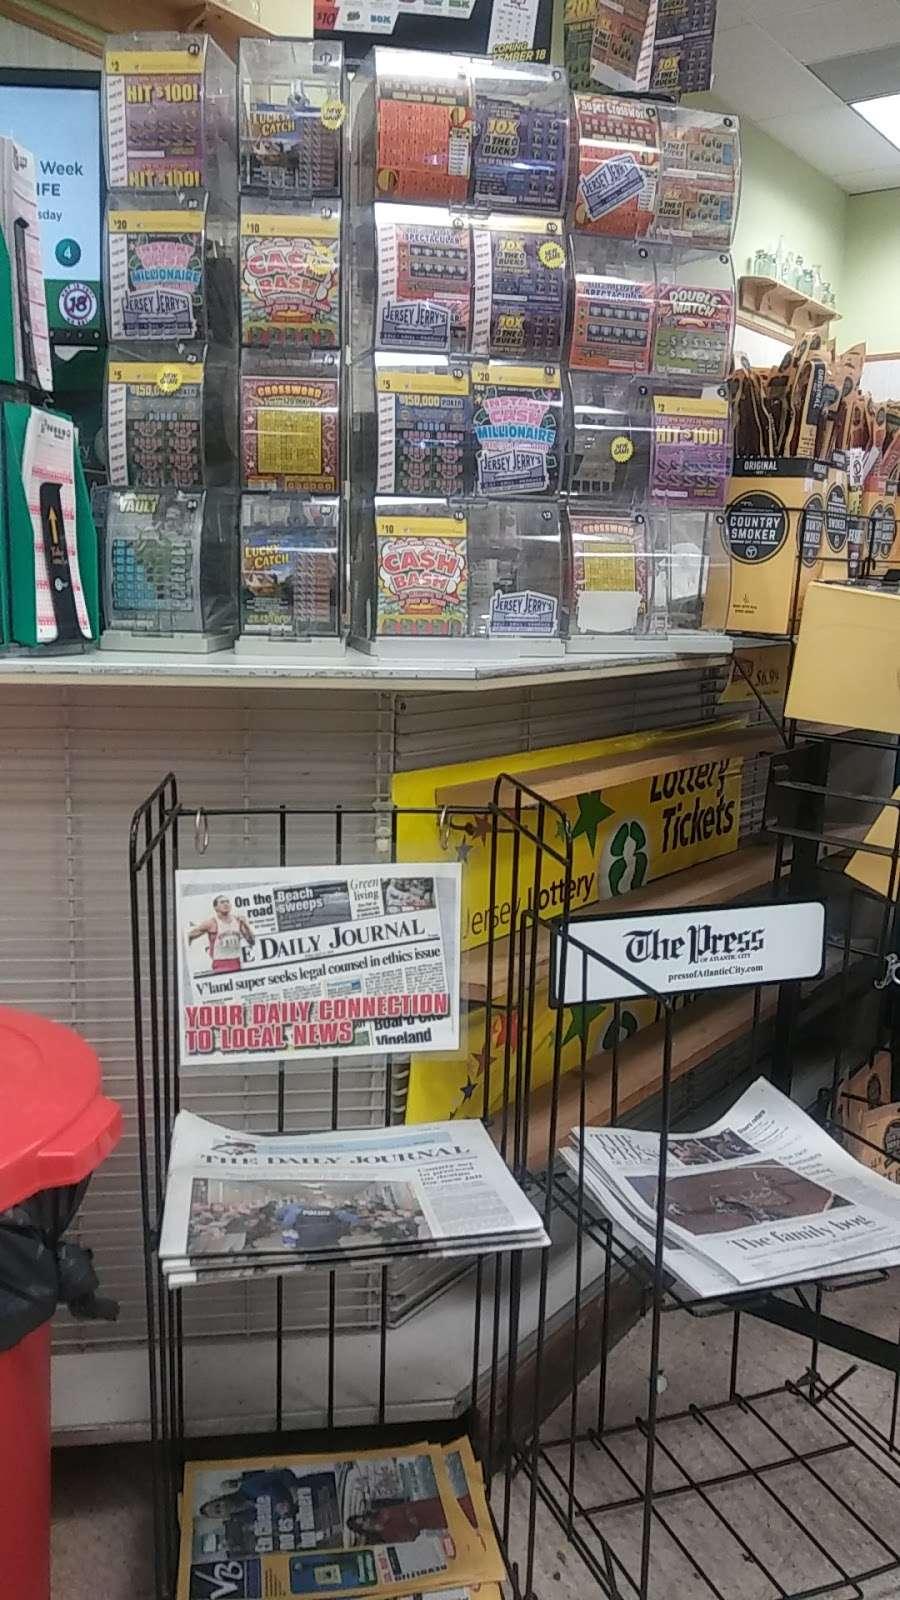 Jersey Jerrys - store    Photo 6 of 10   Address: 1362 S Delsea Dr, Vineland, NJ 08360, USA   Phone: (856) 362-5978